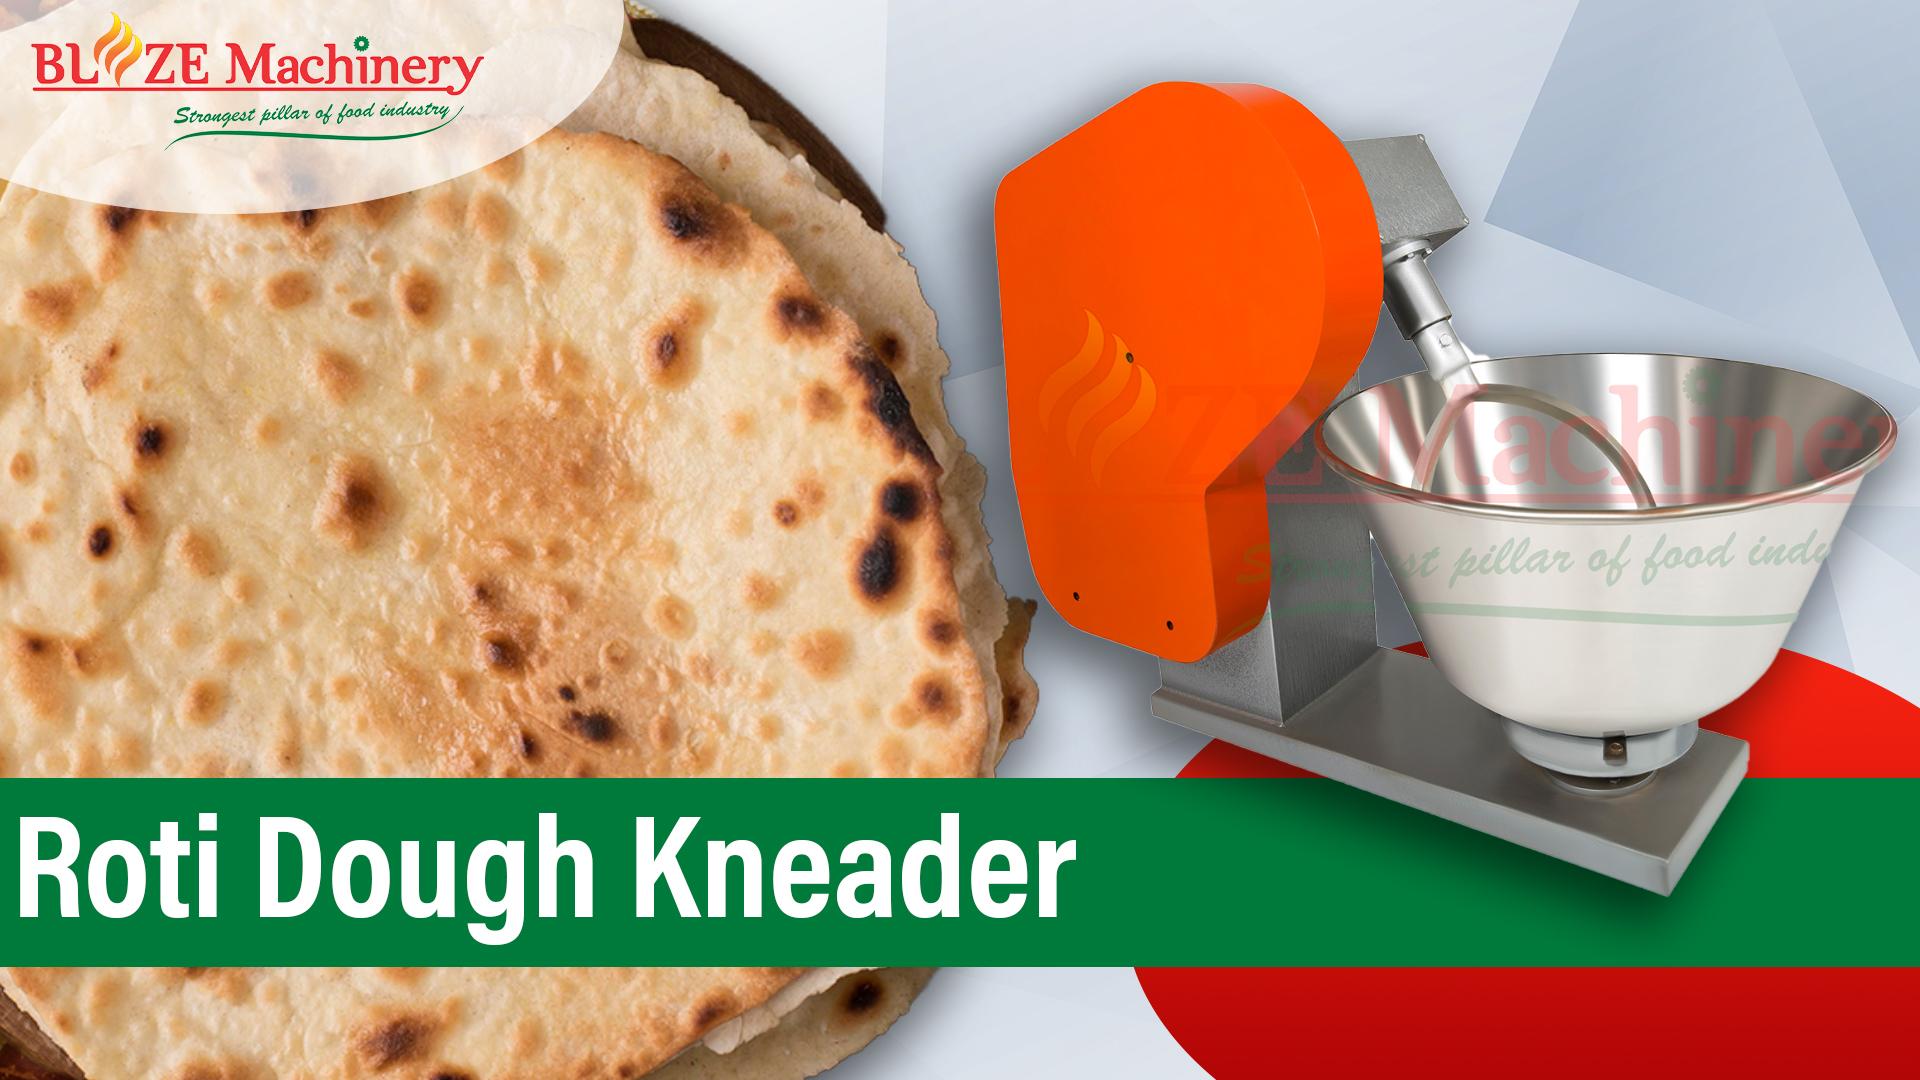 Roti Dough Kneader